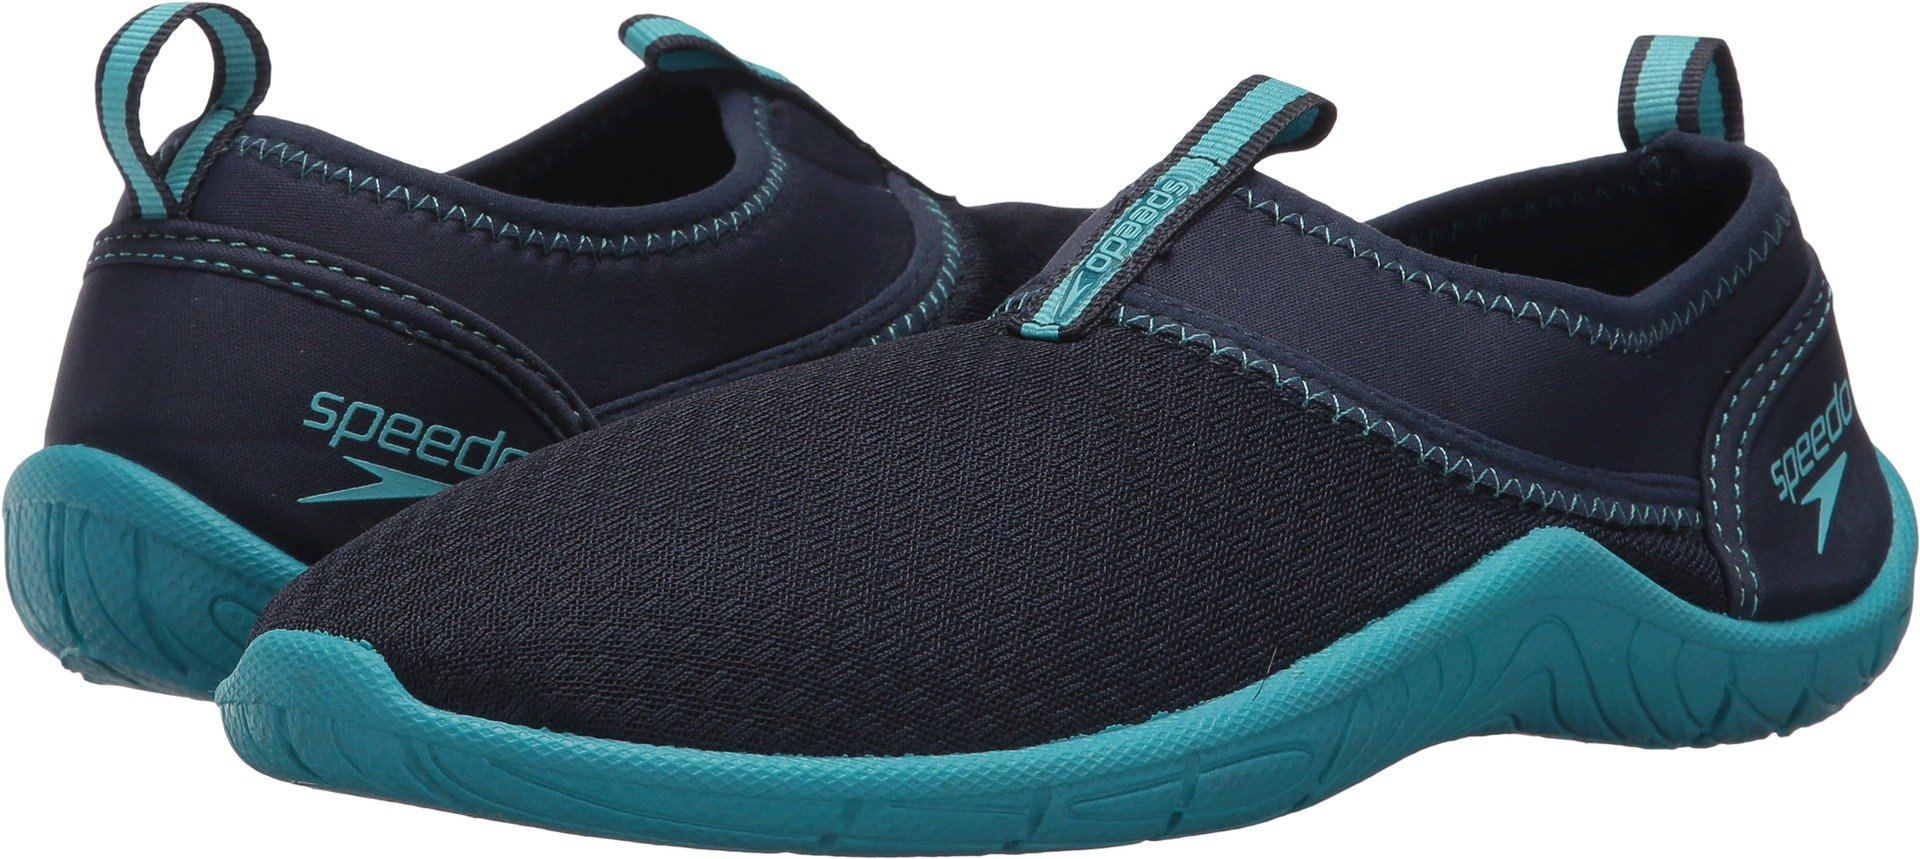 Speedo Women's Tidal Cruiser Water Shoes Navy/Blue 7